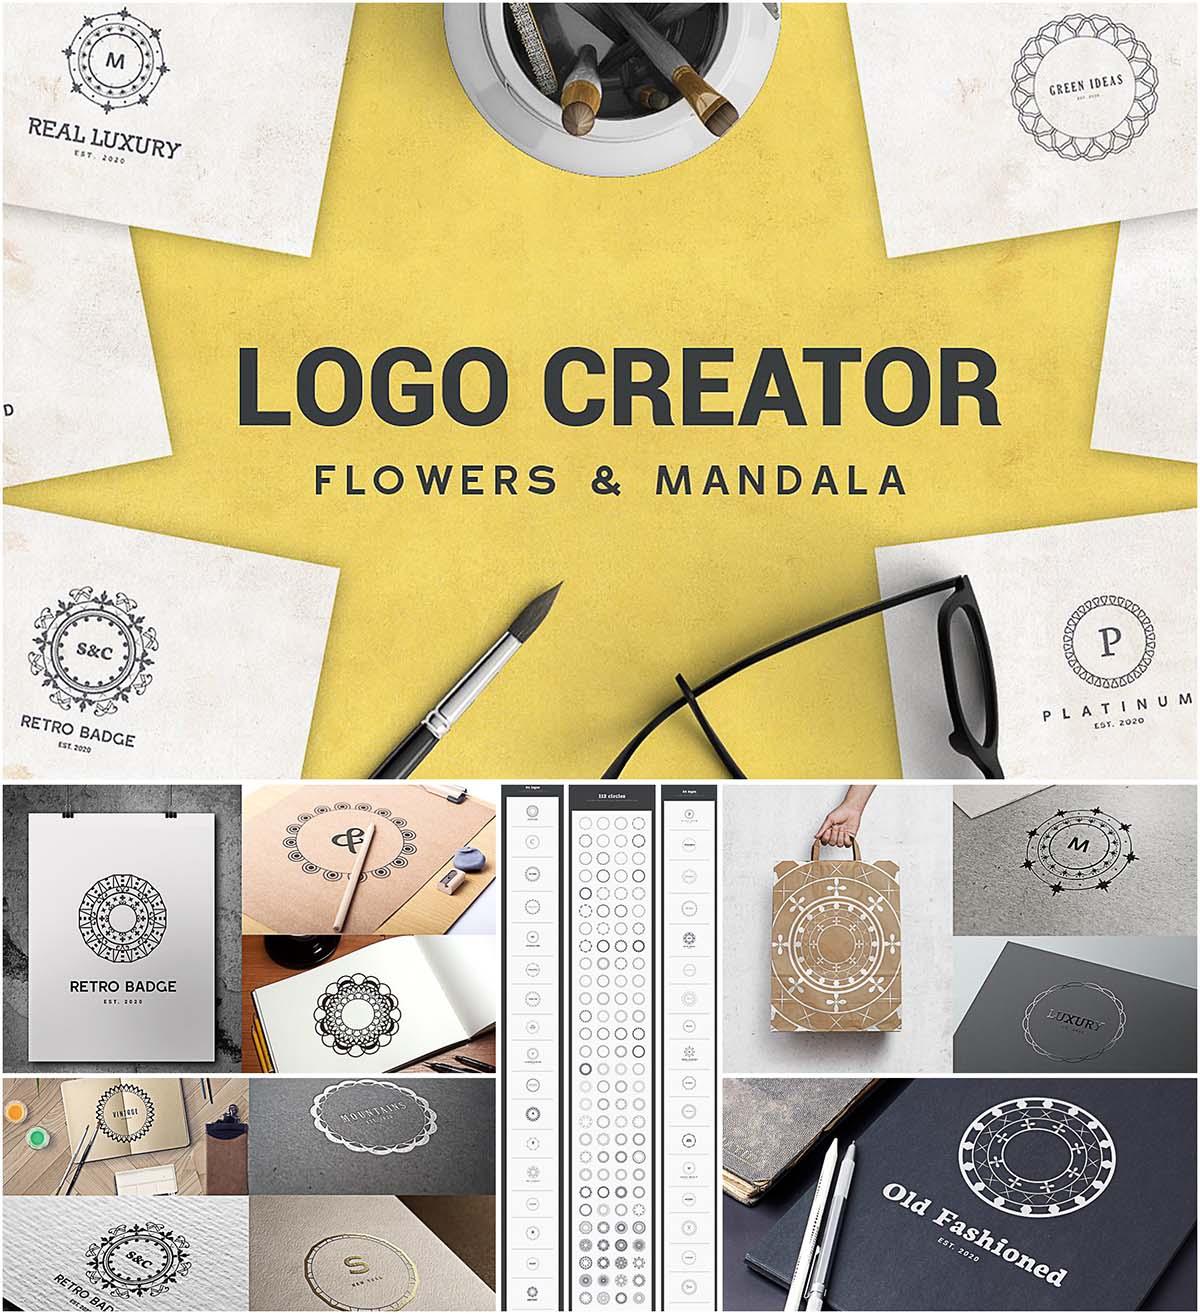 Logo creator flowers and mandala